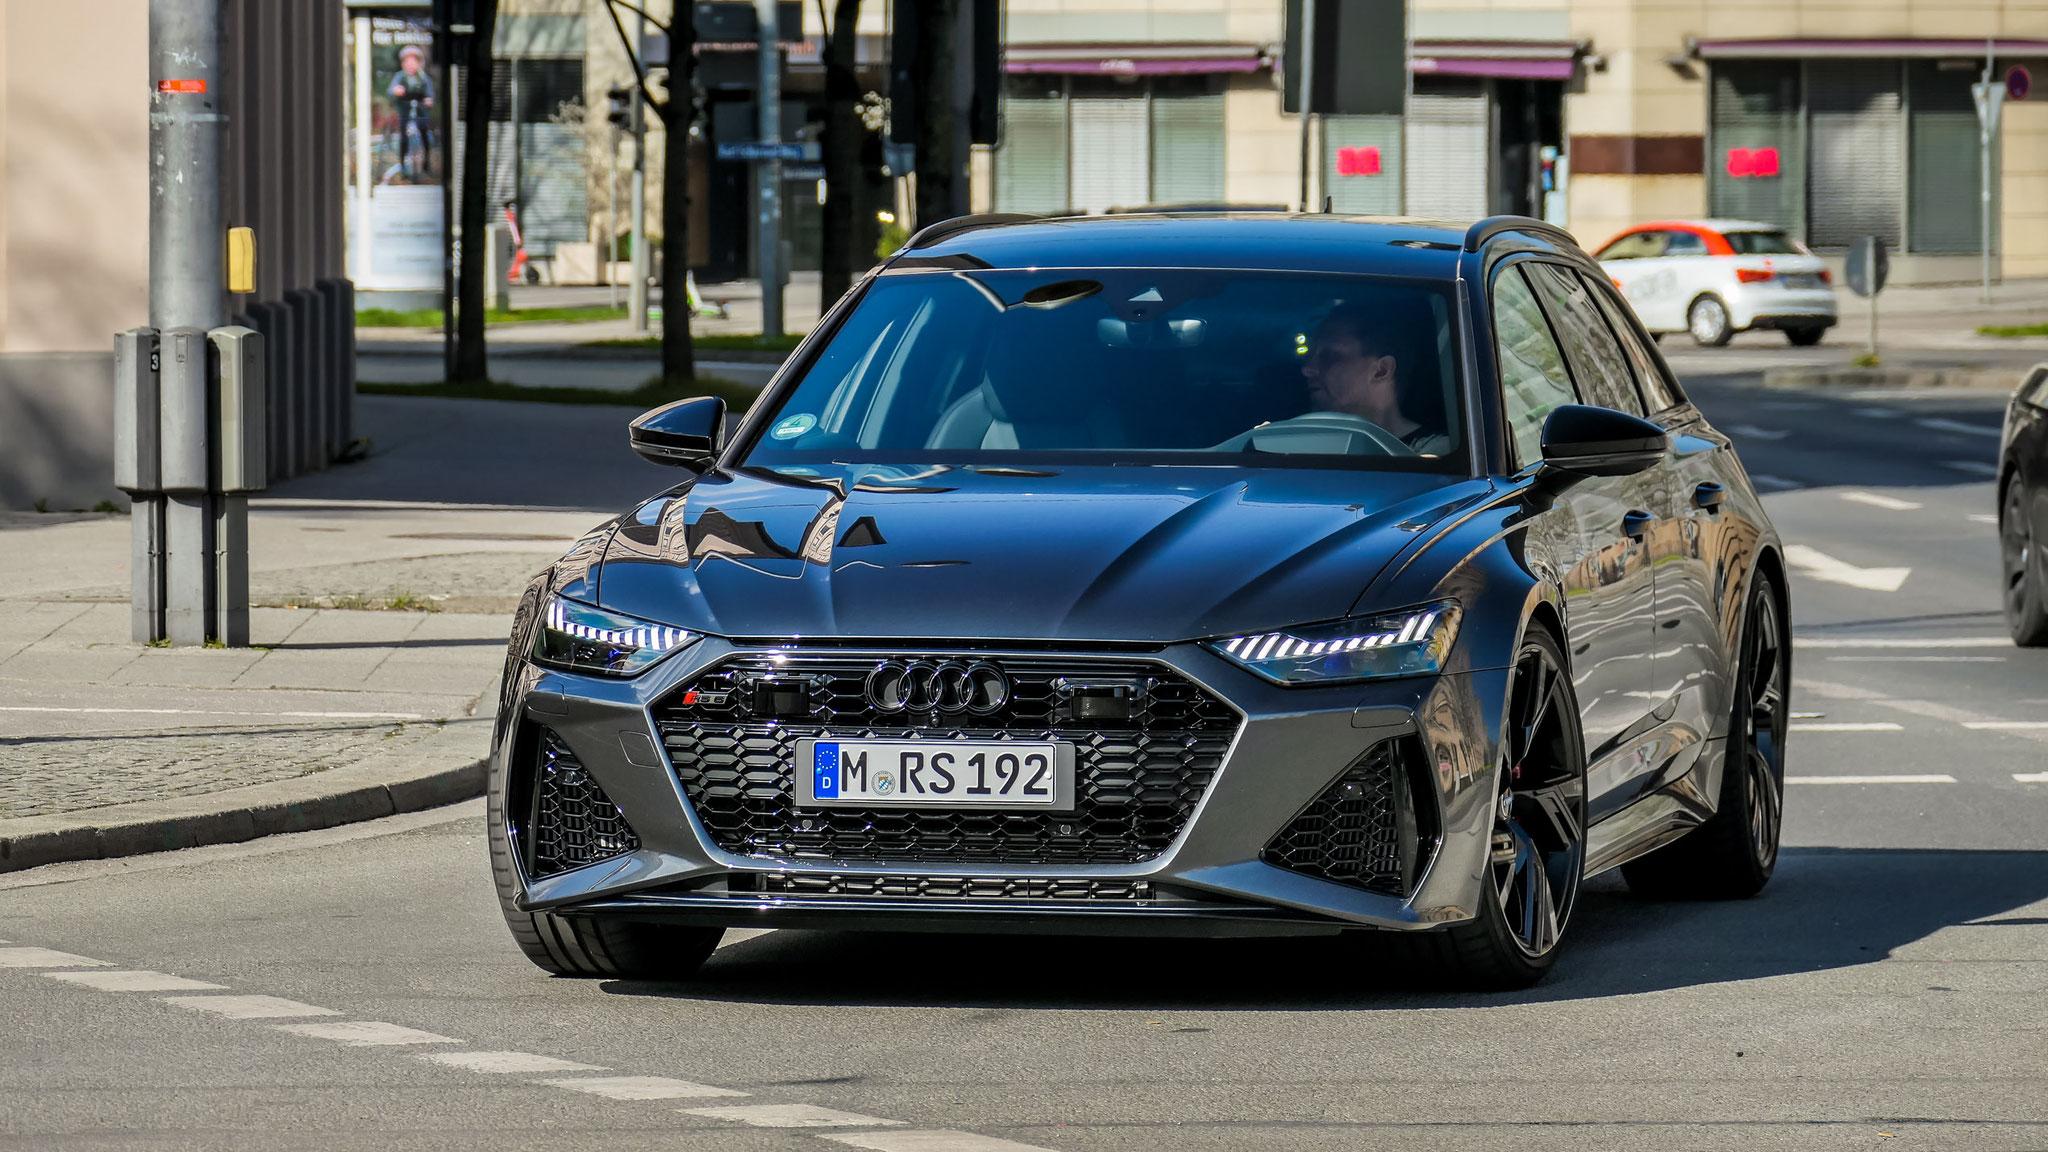 Audi RS6 - M-RS-192